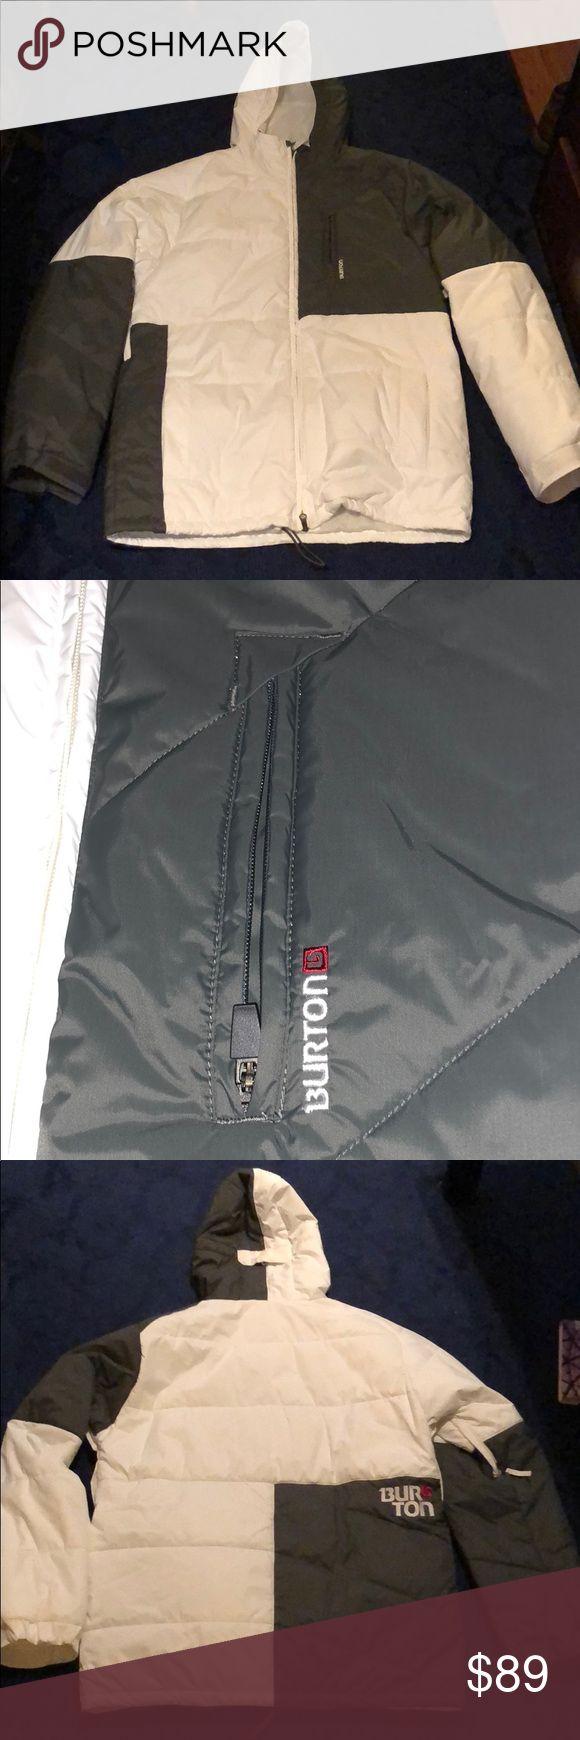 Burton Ski Jacket in Like New condition! White/Grey burton ski jacket worn once! Burton Jackets & Coats Ski & Snowboard